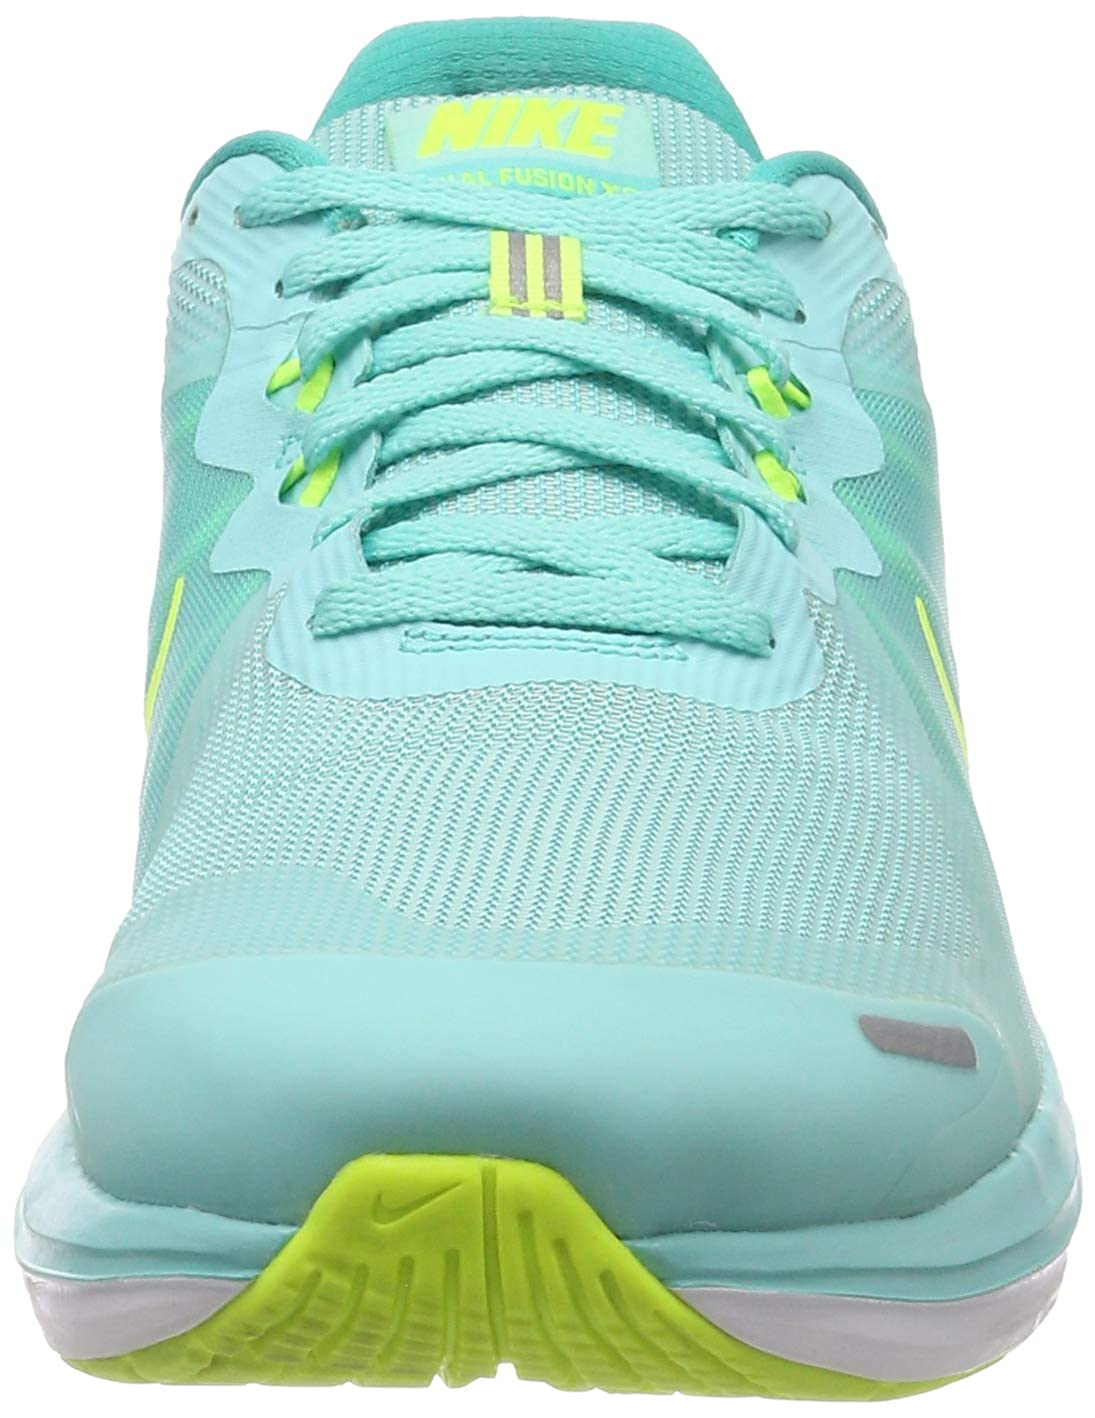 online store 728c6 03374 Nike 819318-300, Scarpe da Trail Running Donna, Turchese (300), 44.5 EU  Amazon.it Scarpe e borse